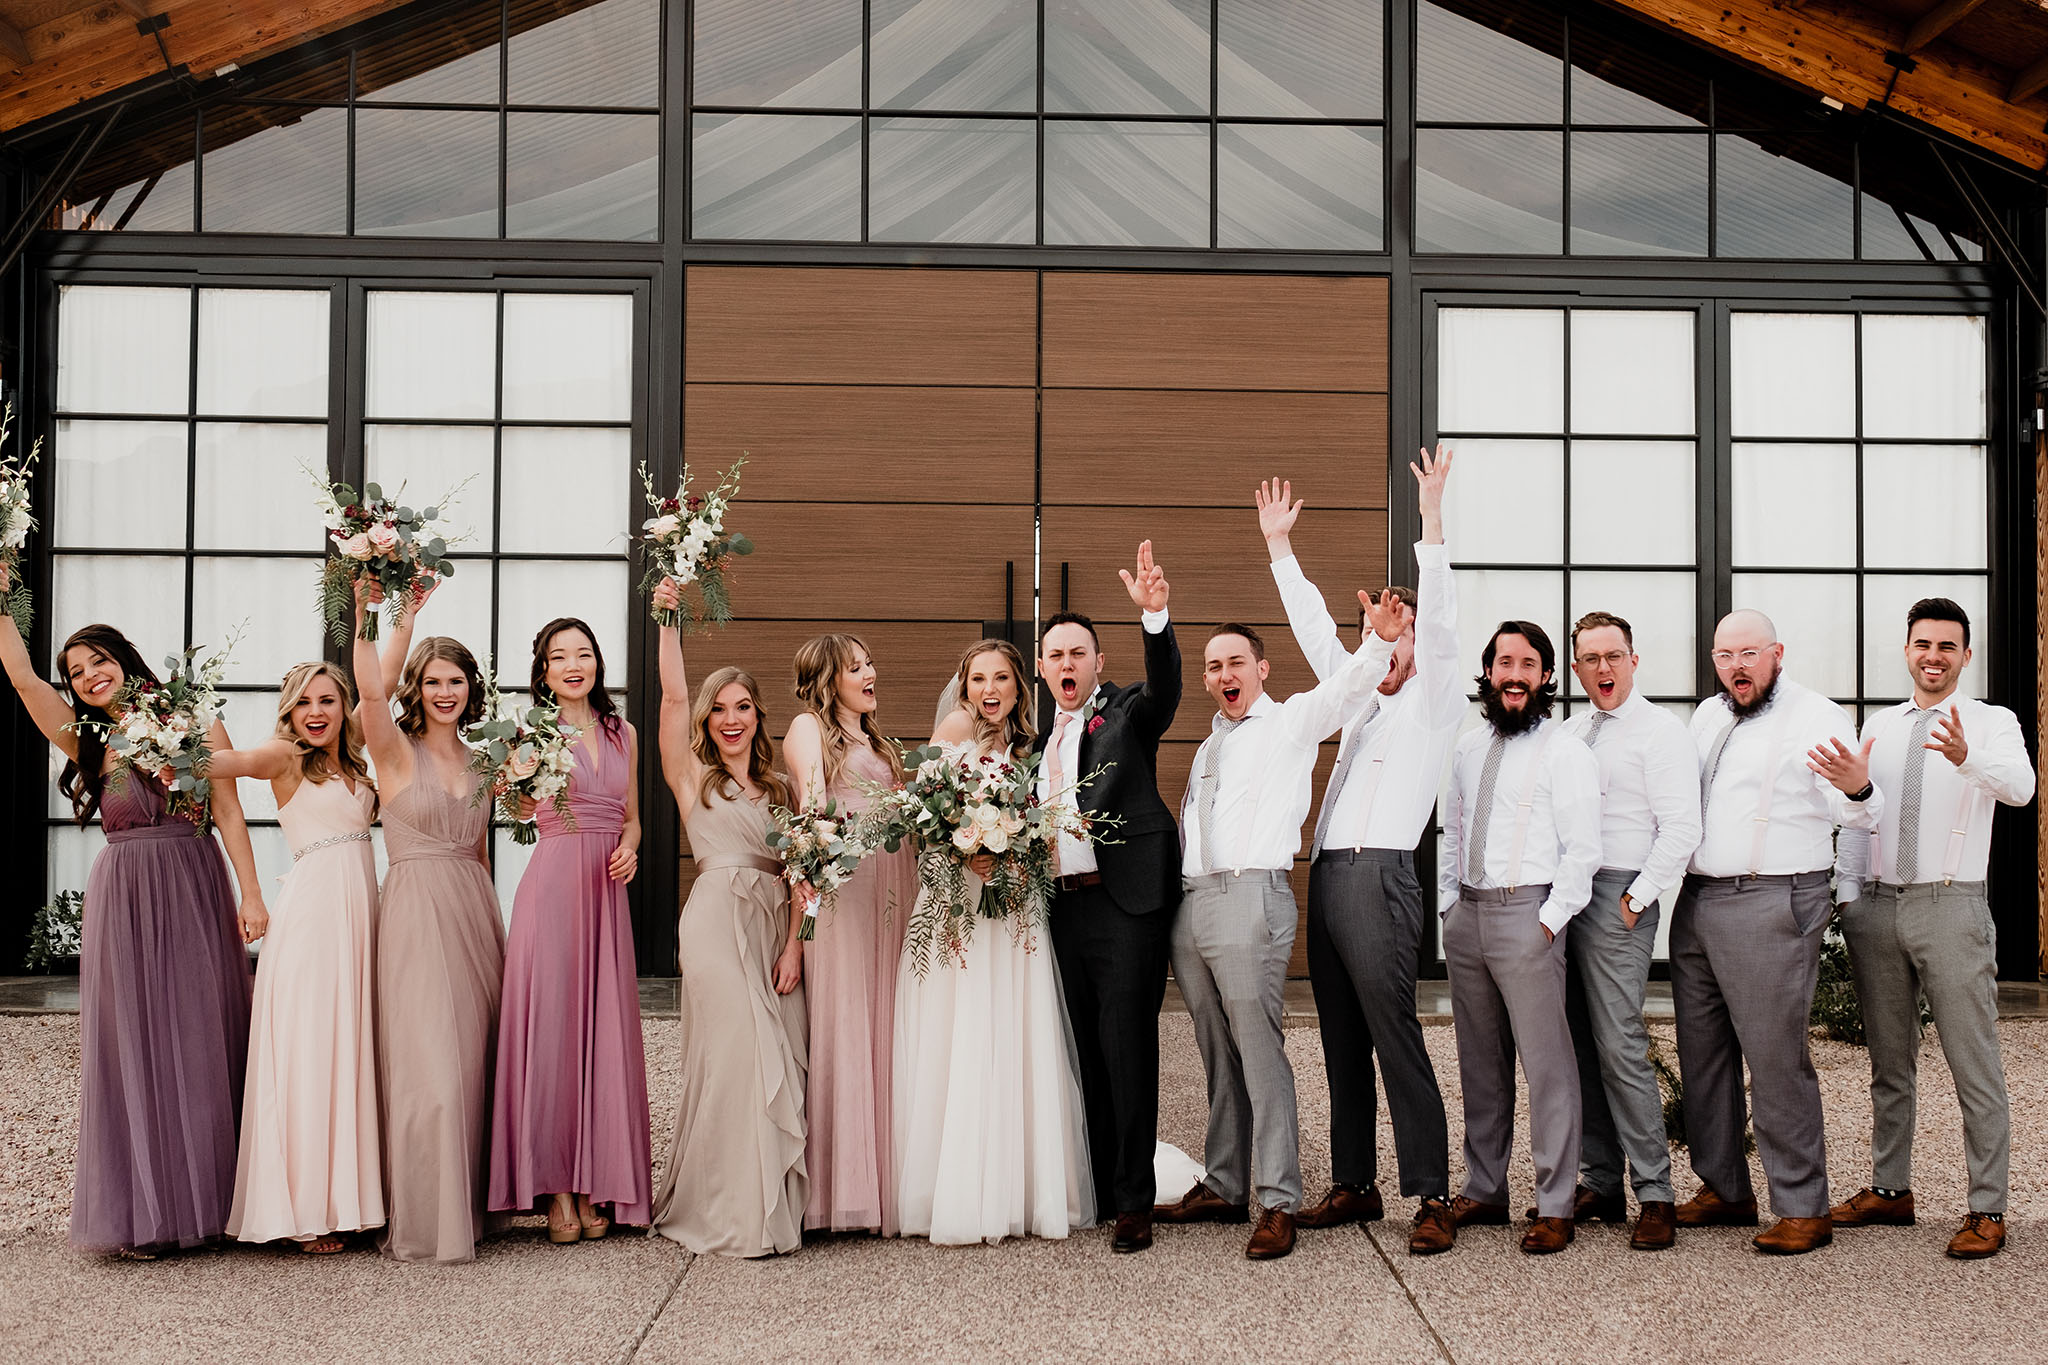 Arizona-Wedding-Photographer-The-Paseo-Venue5.jpg